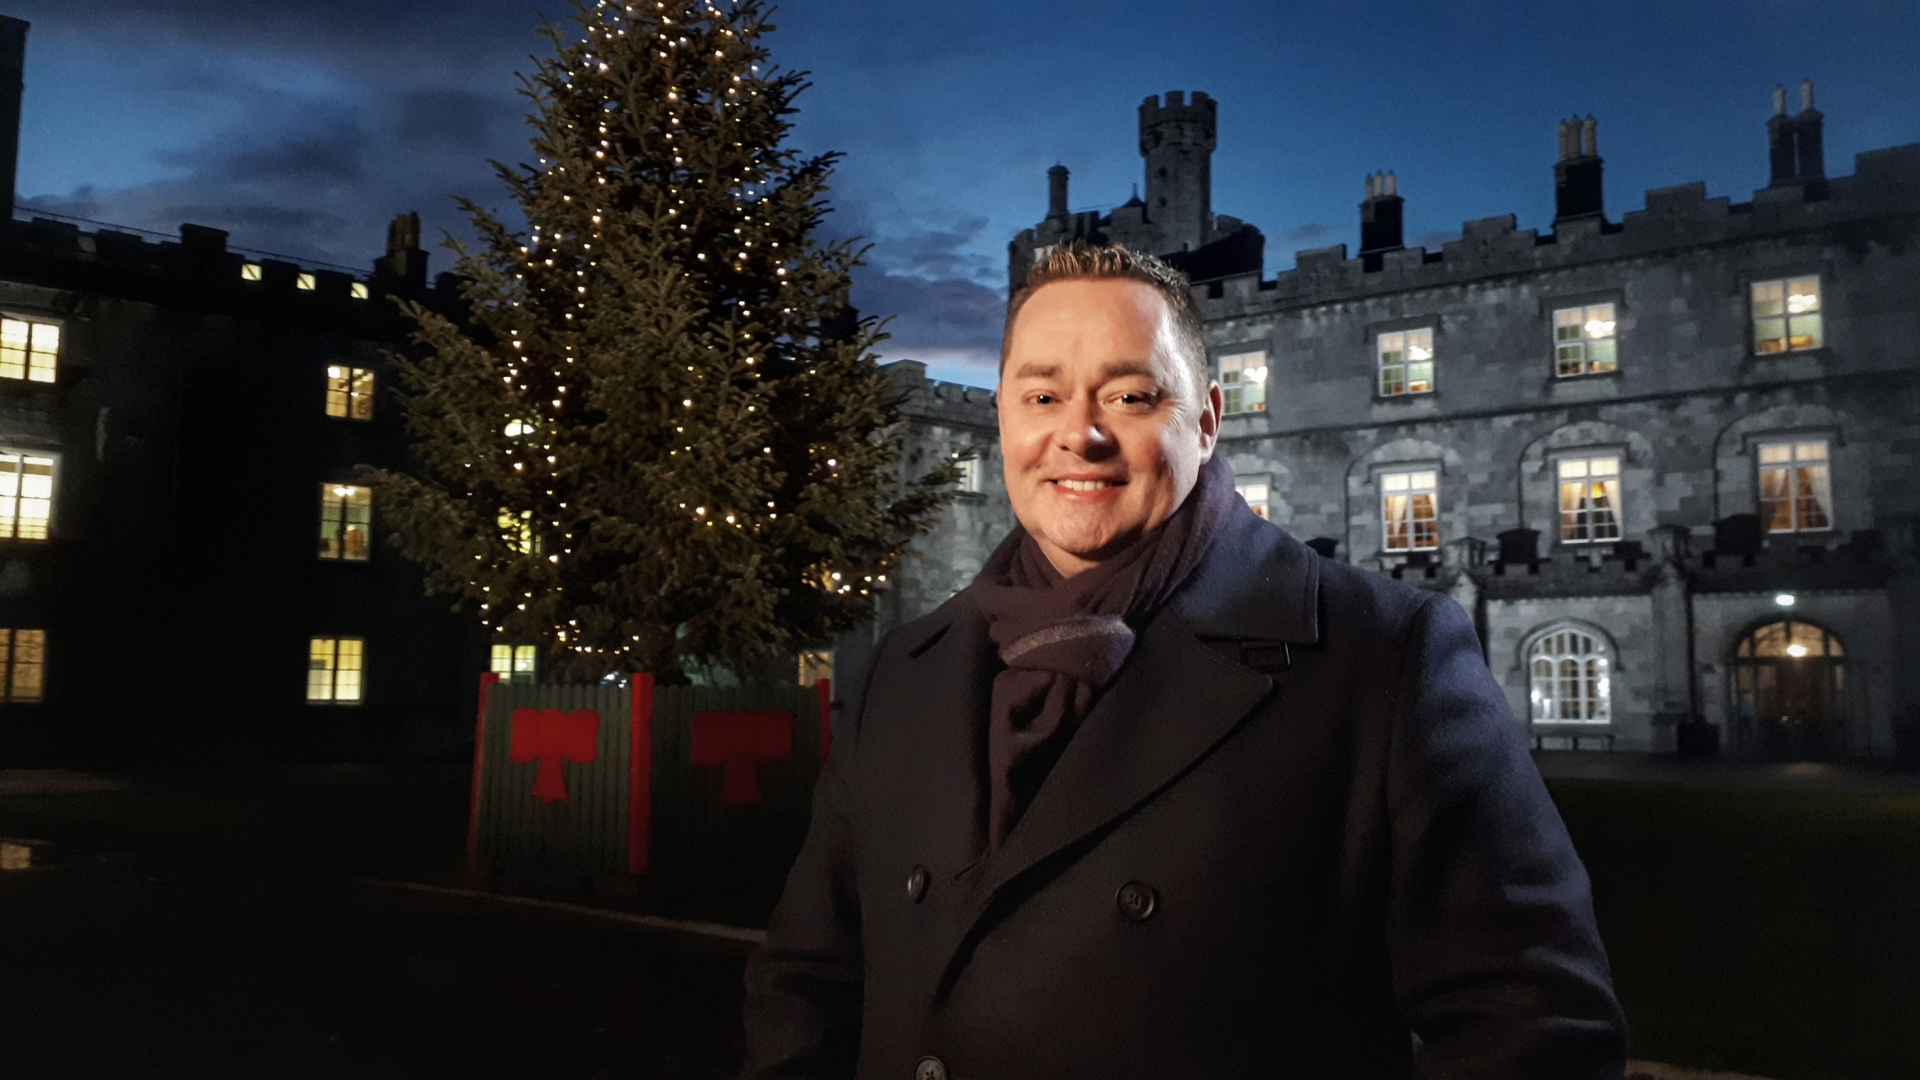 Kilkenny Christmas